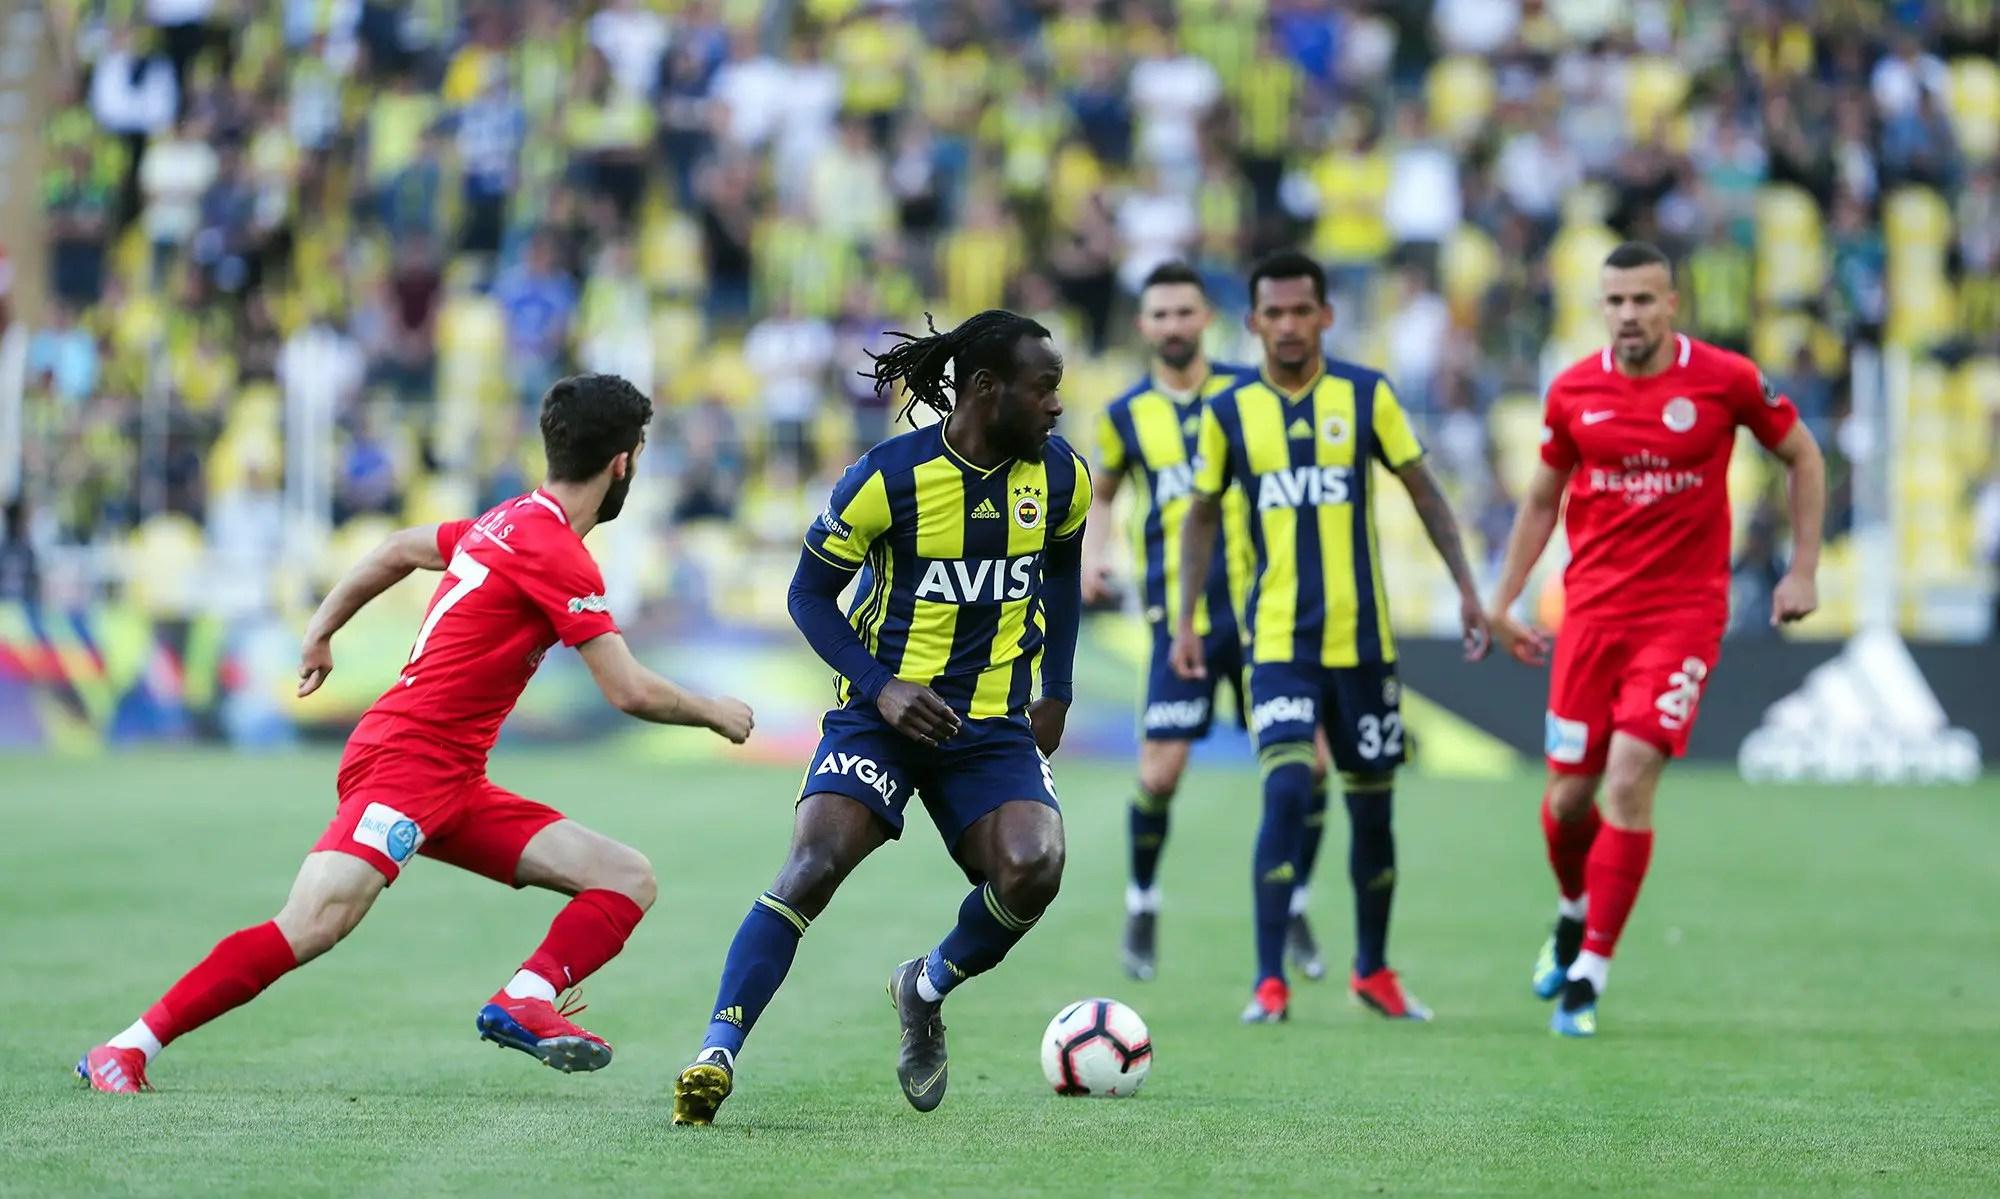 Moses On Target In Fenerbahce Home Win Vs Antalyaspor; Abdullahi's Bursaspor Relegated